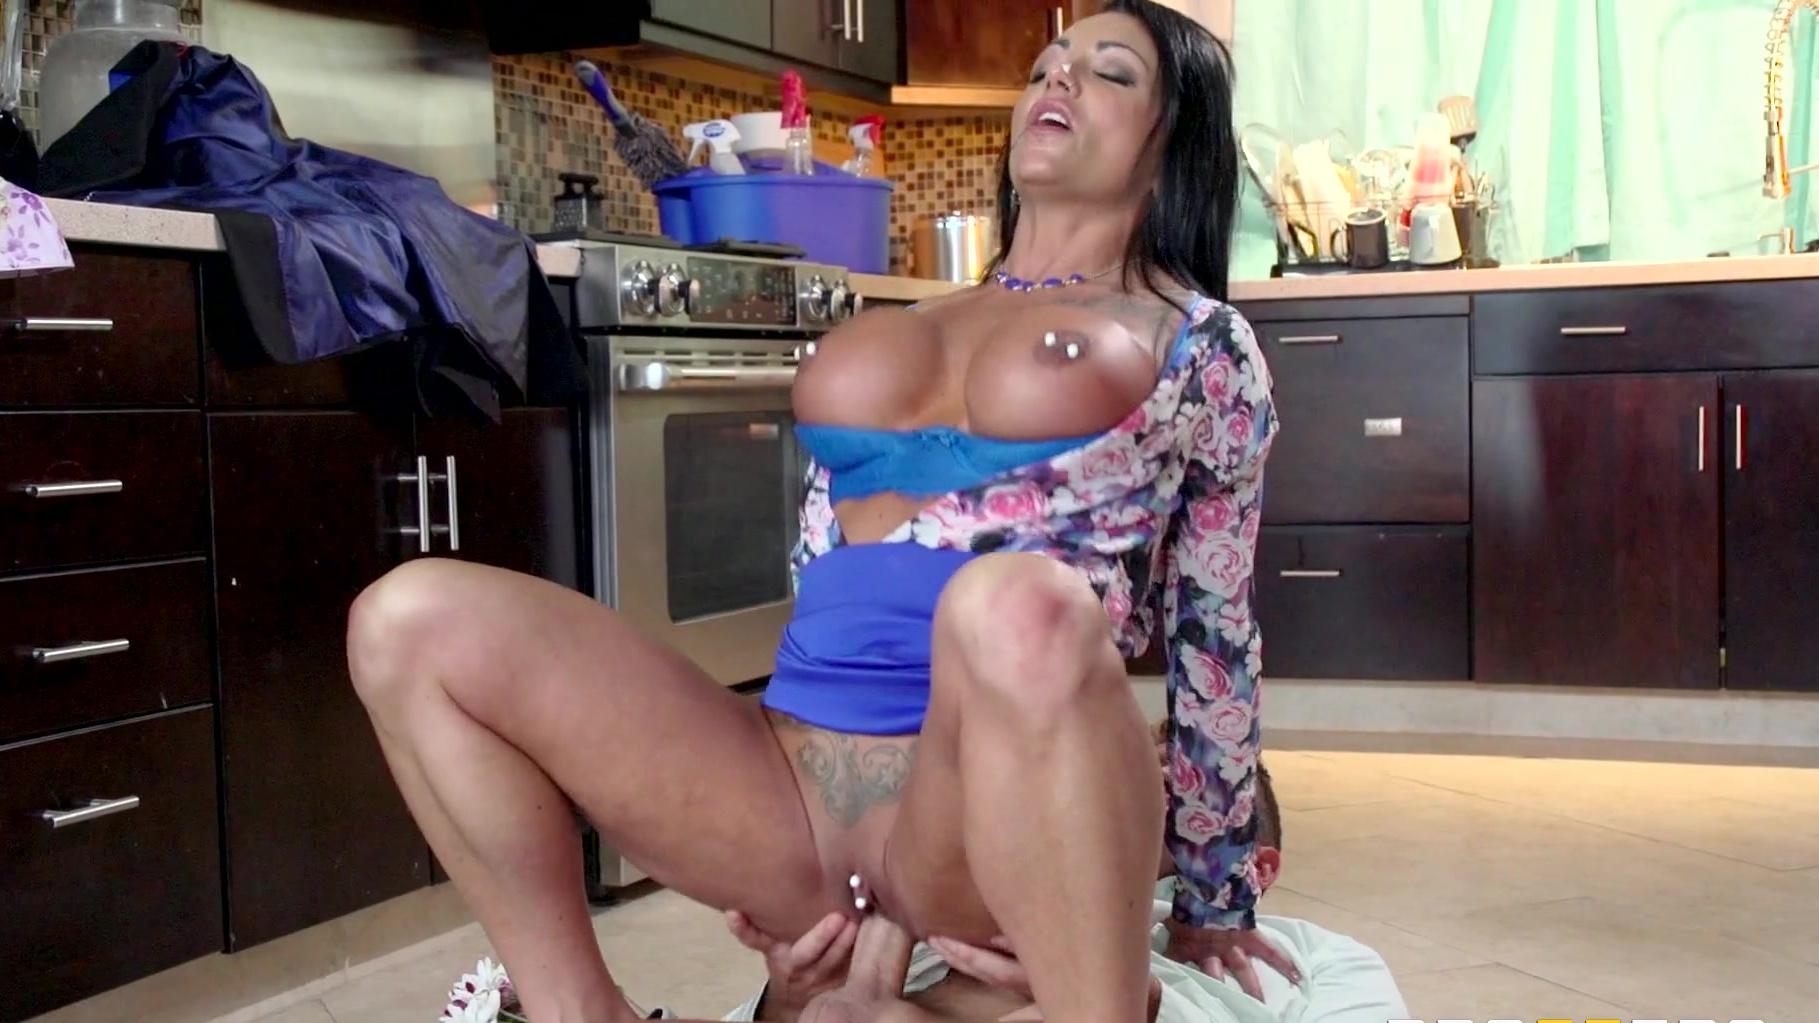 Ashton Blake Mom Go Black Porn ashton blake gives a blowjob & titfuck then rides her